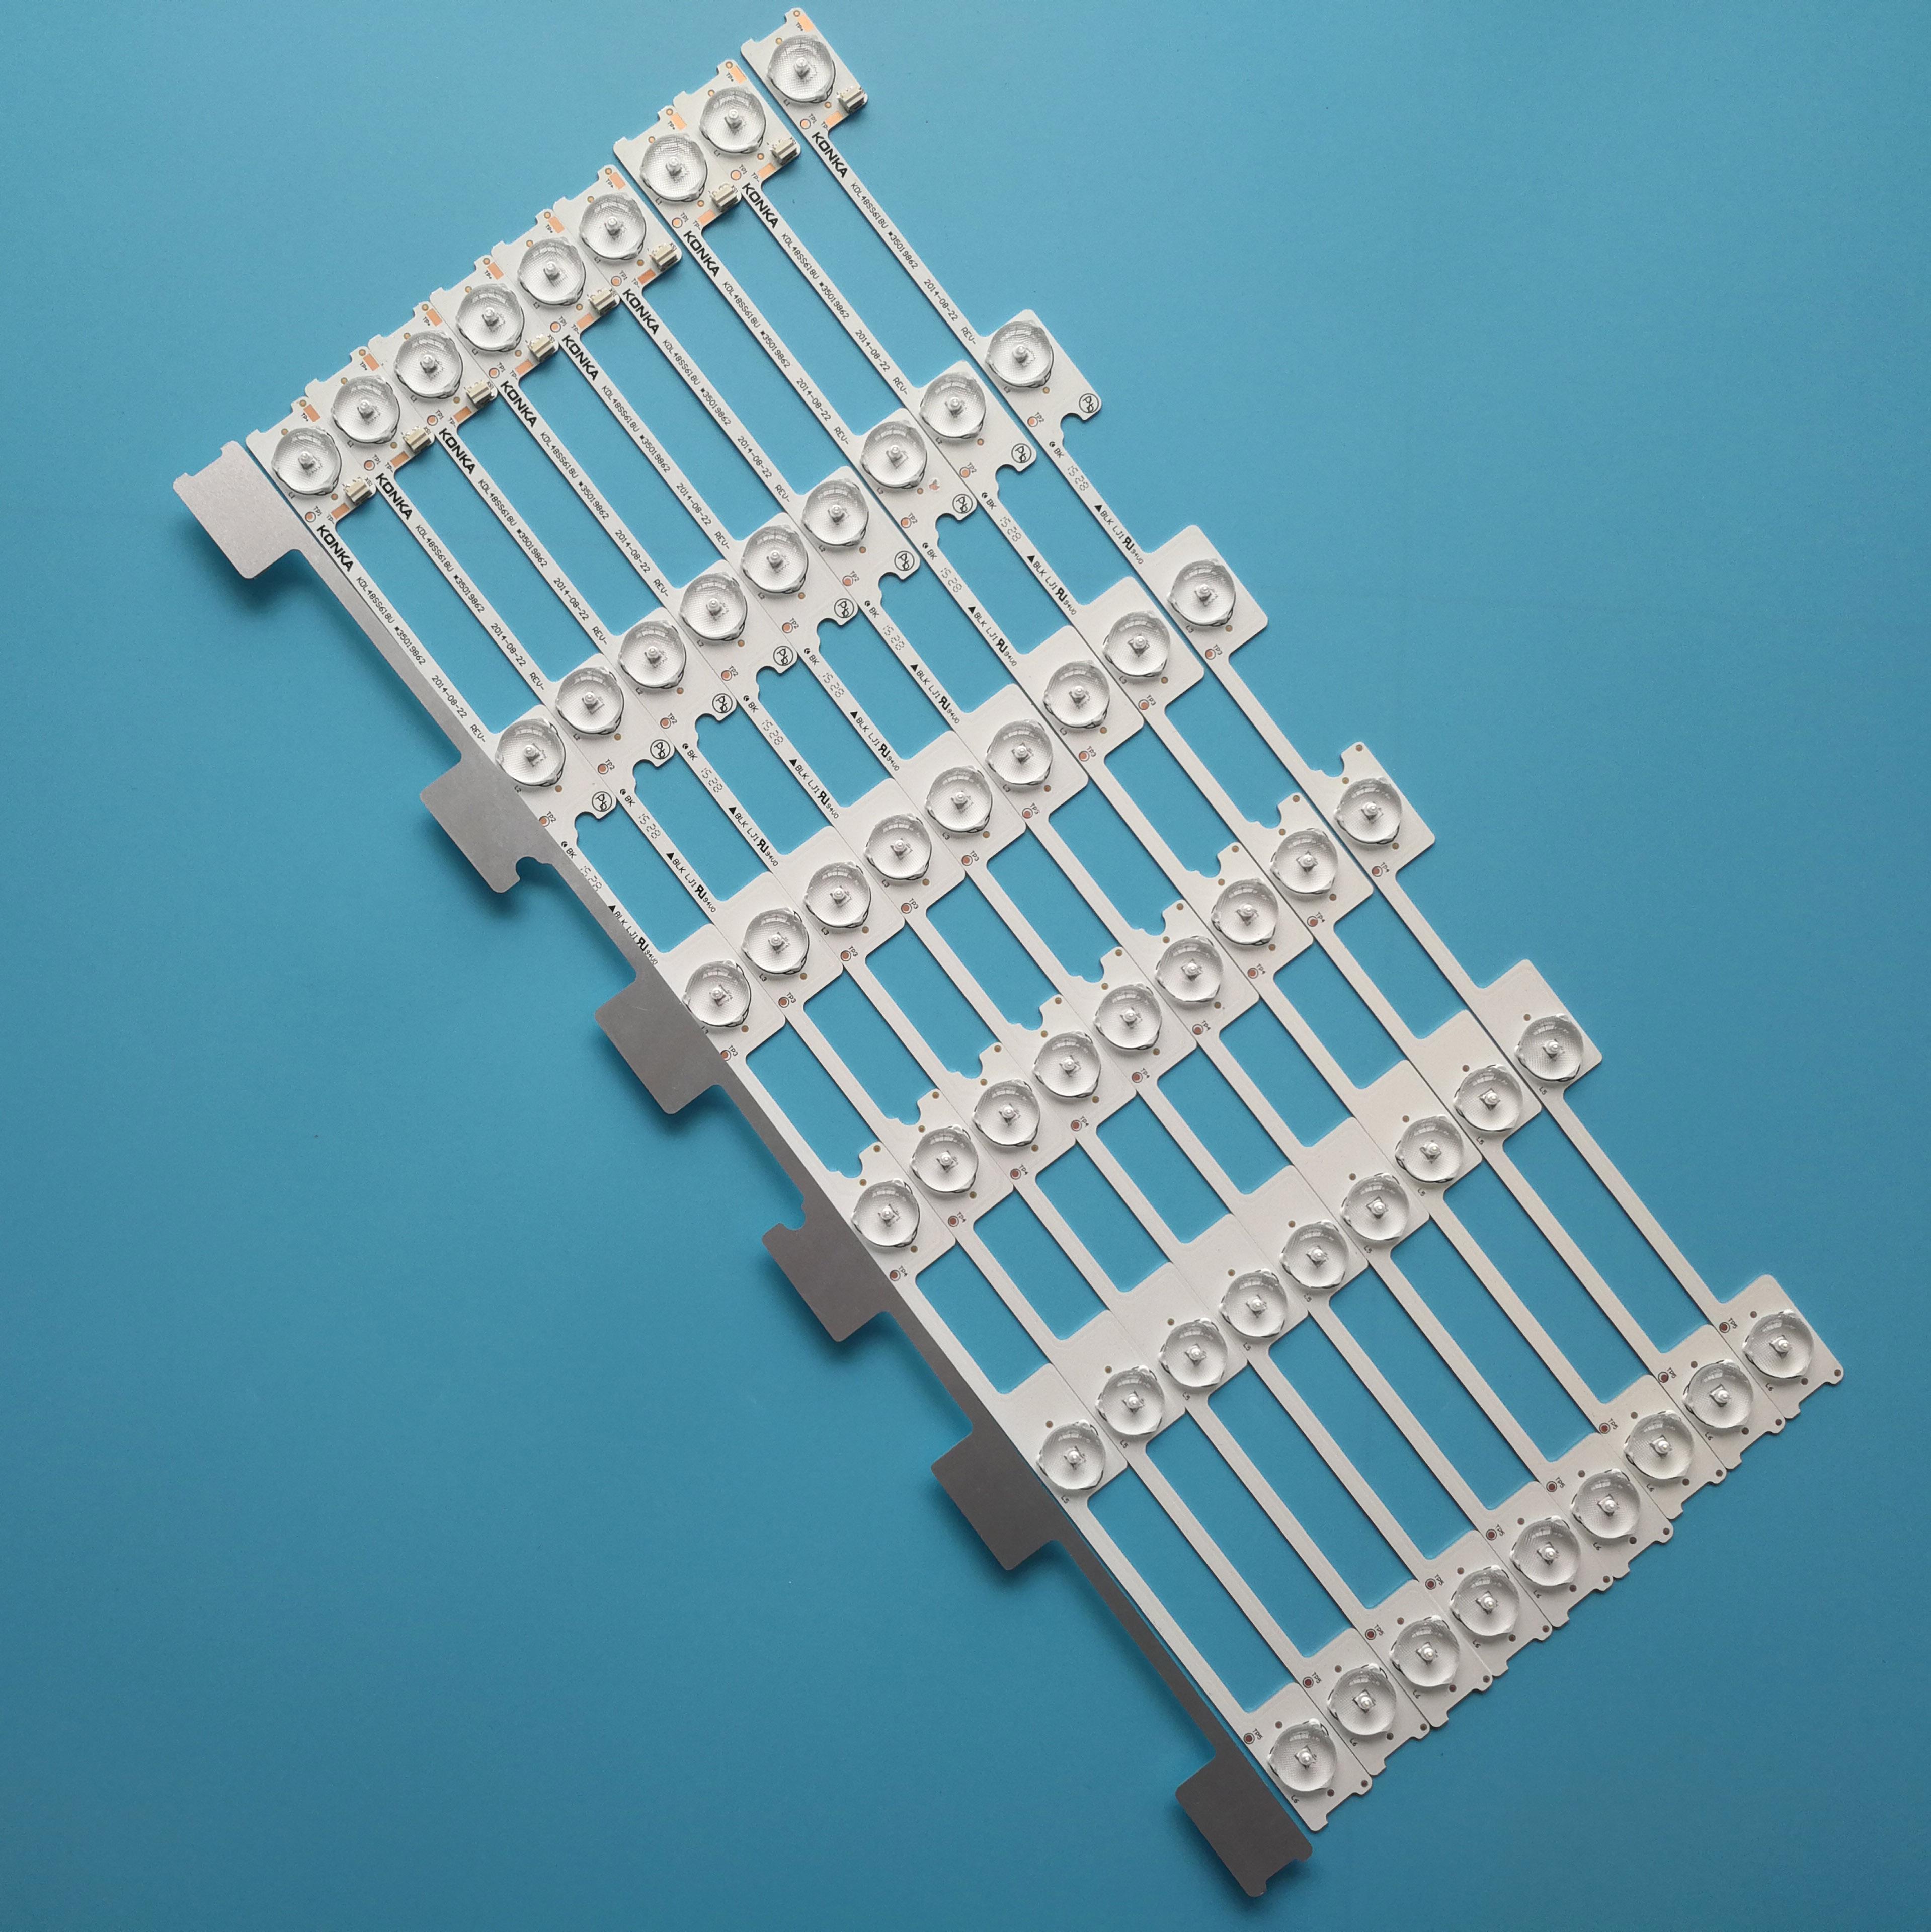 30 50 100 Pieces lot New LED strip For Konka KDL48JT618A KDL48JT618U 35018539 35018539 35018540 35019862